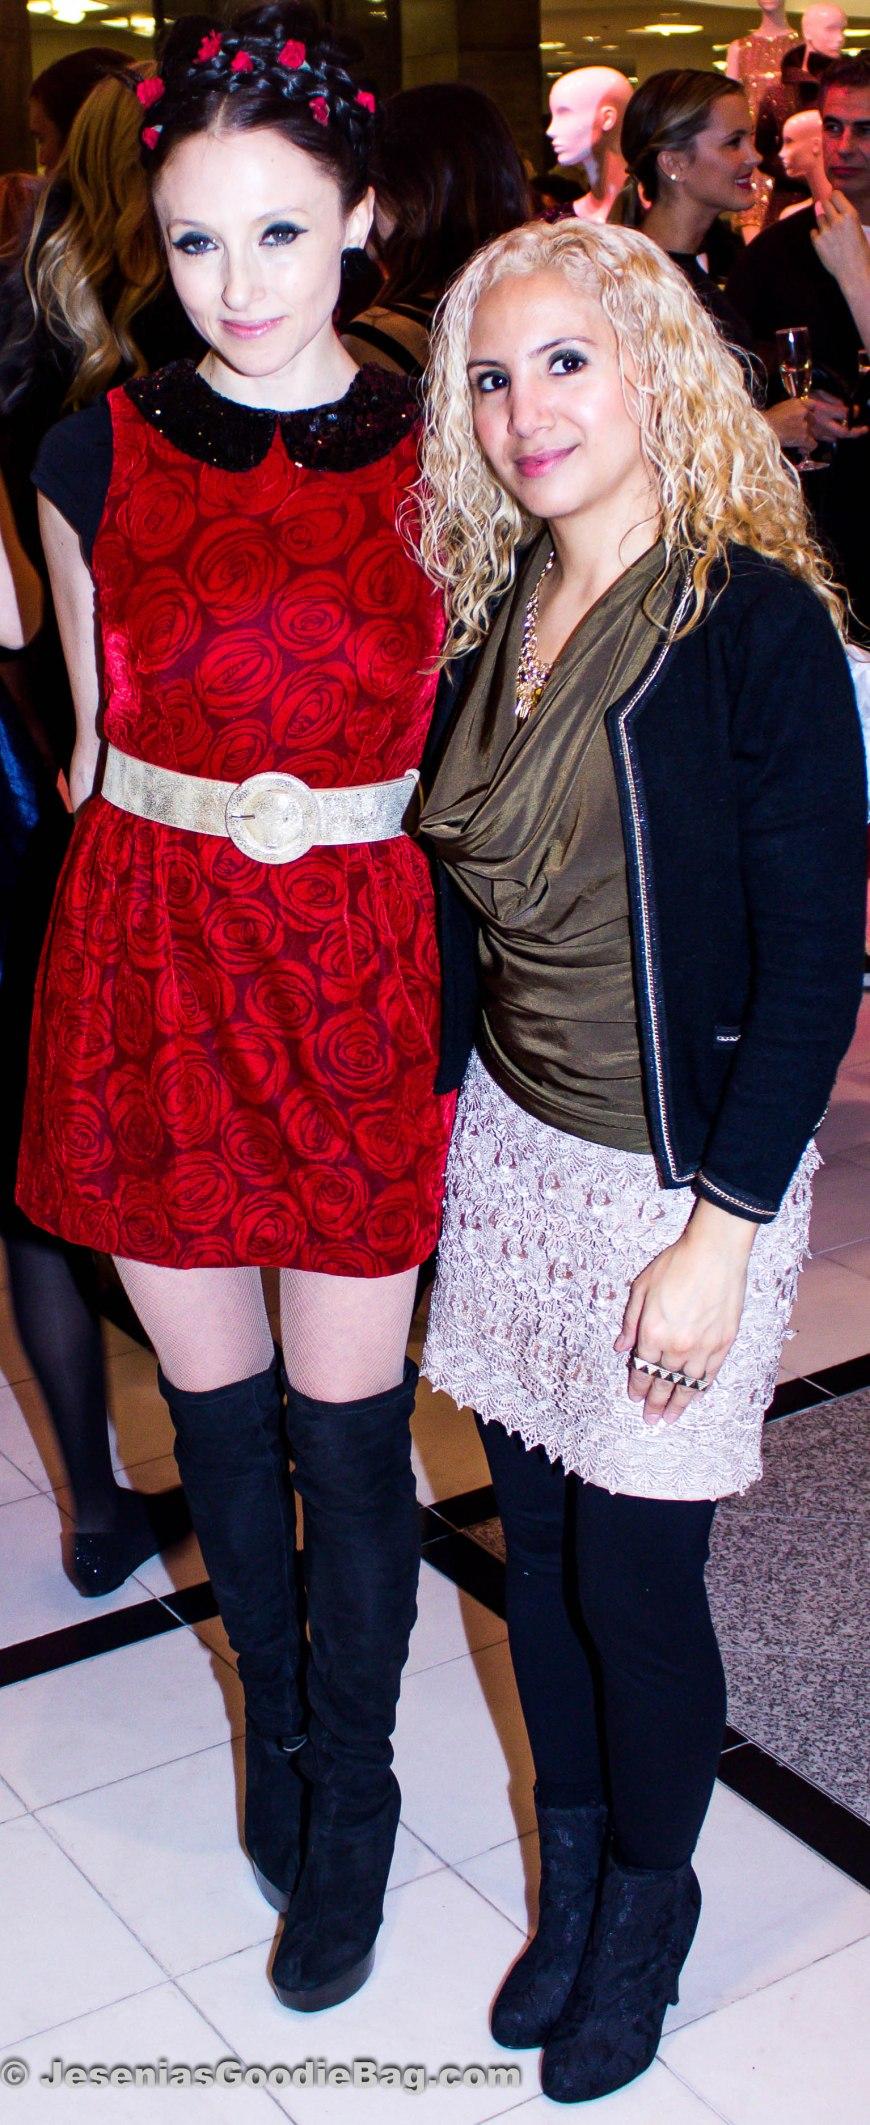 Stacey Bendet (Alice + Olivia Designer) with Jesenia (JGB Editor)